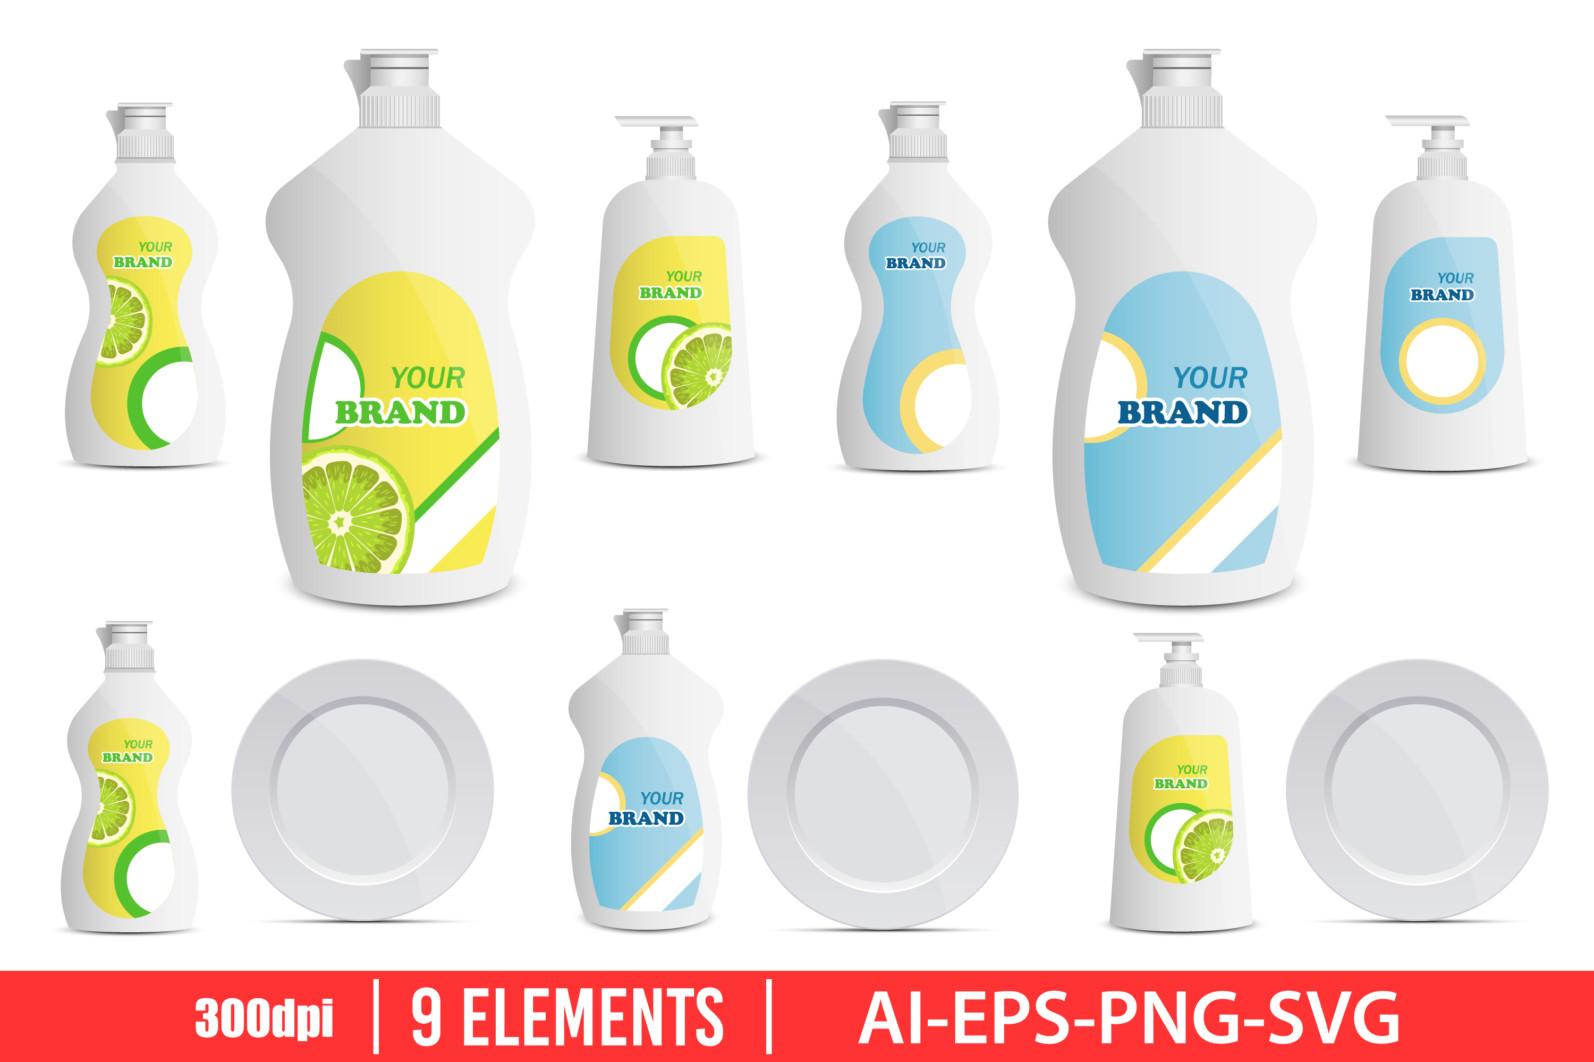 Diswashing liquid bottle clipart vector design illustration. Vector Clipart Print - DISHWASH LIQUID scaled -